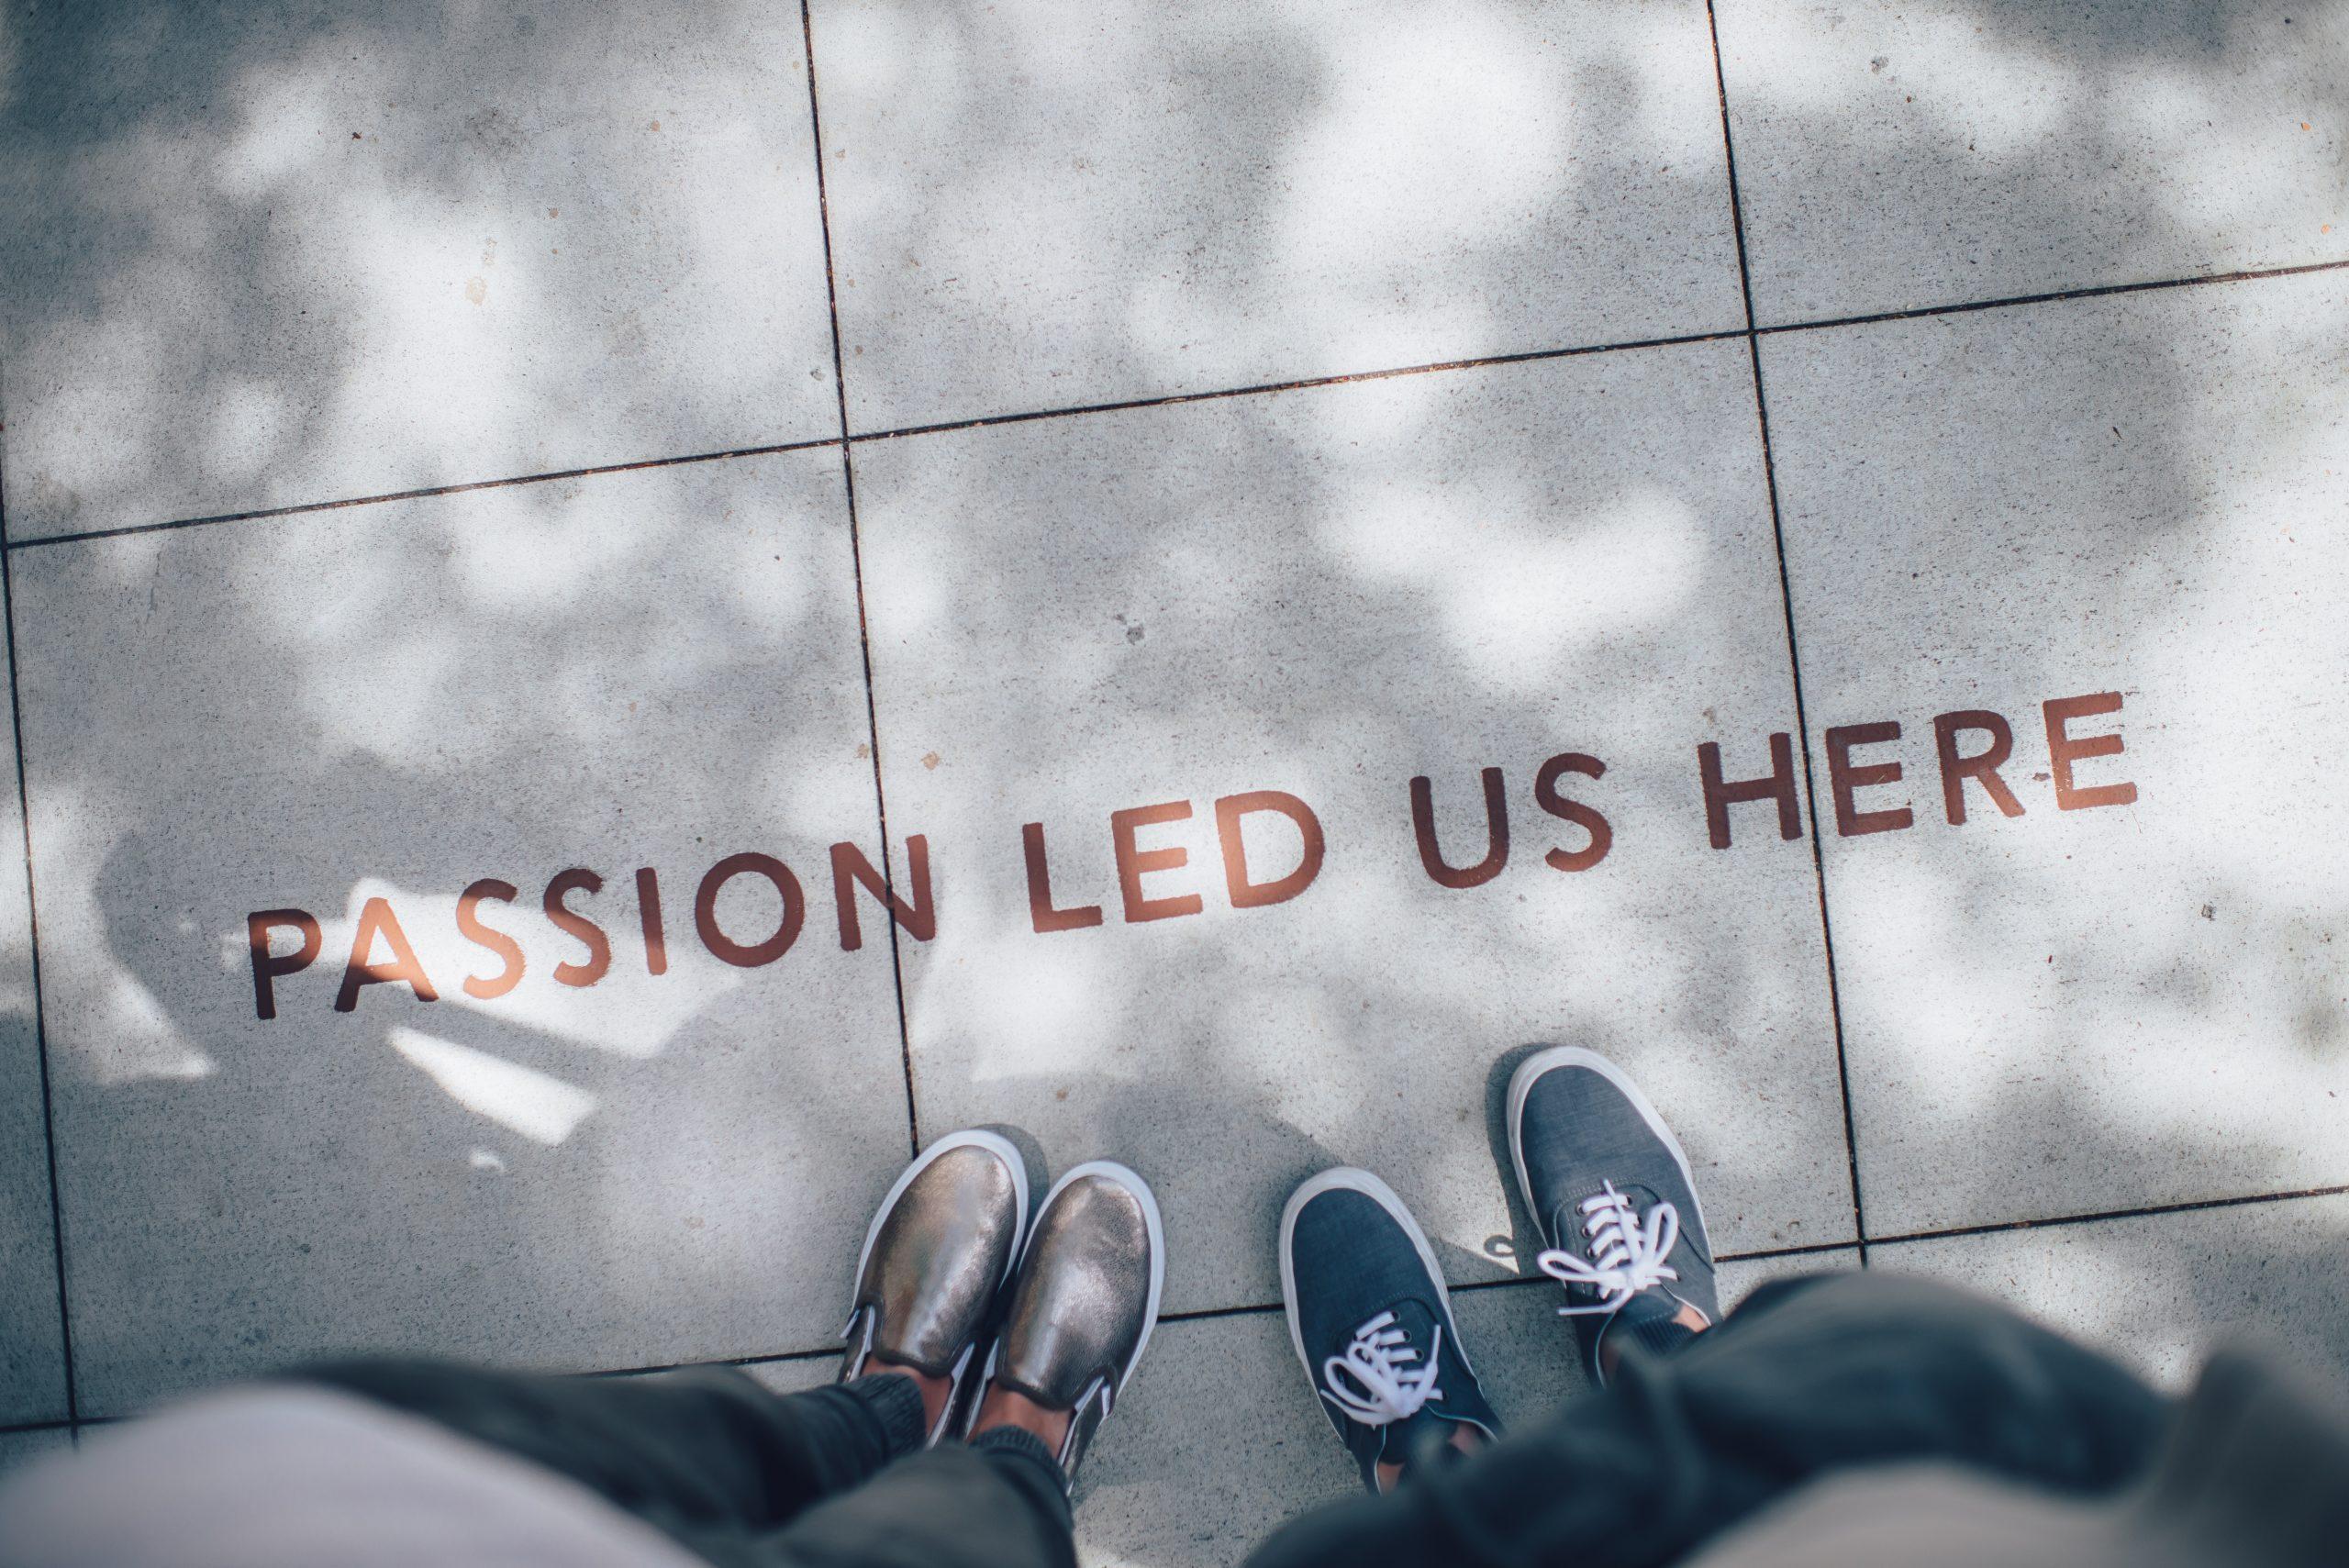 'Passion led us here' written on sidewalk